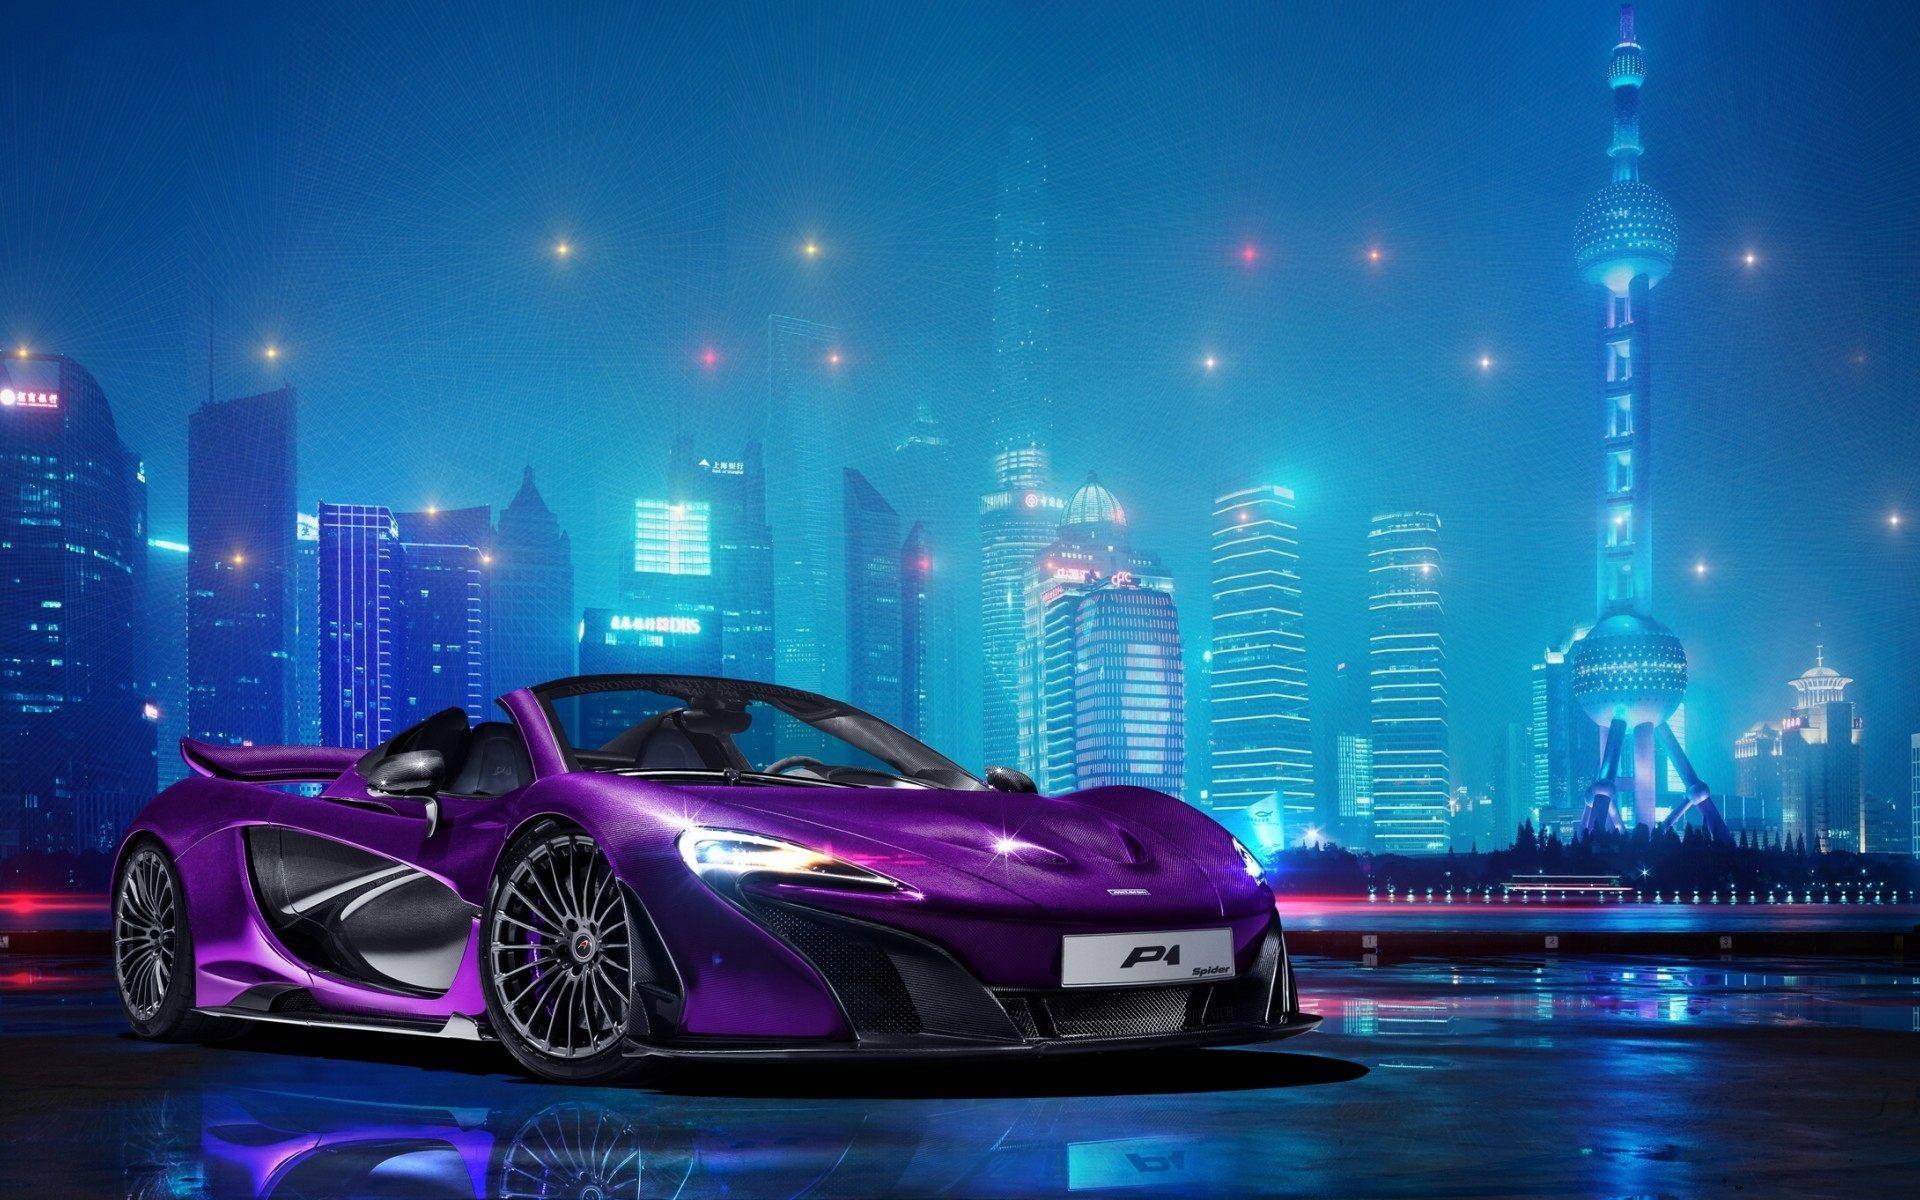 Purple Car Hd Wallpapers Top Free Purple Car Hd Backgrounds